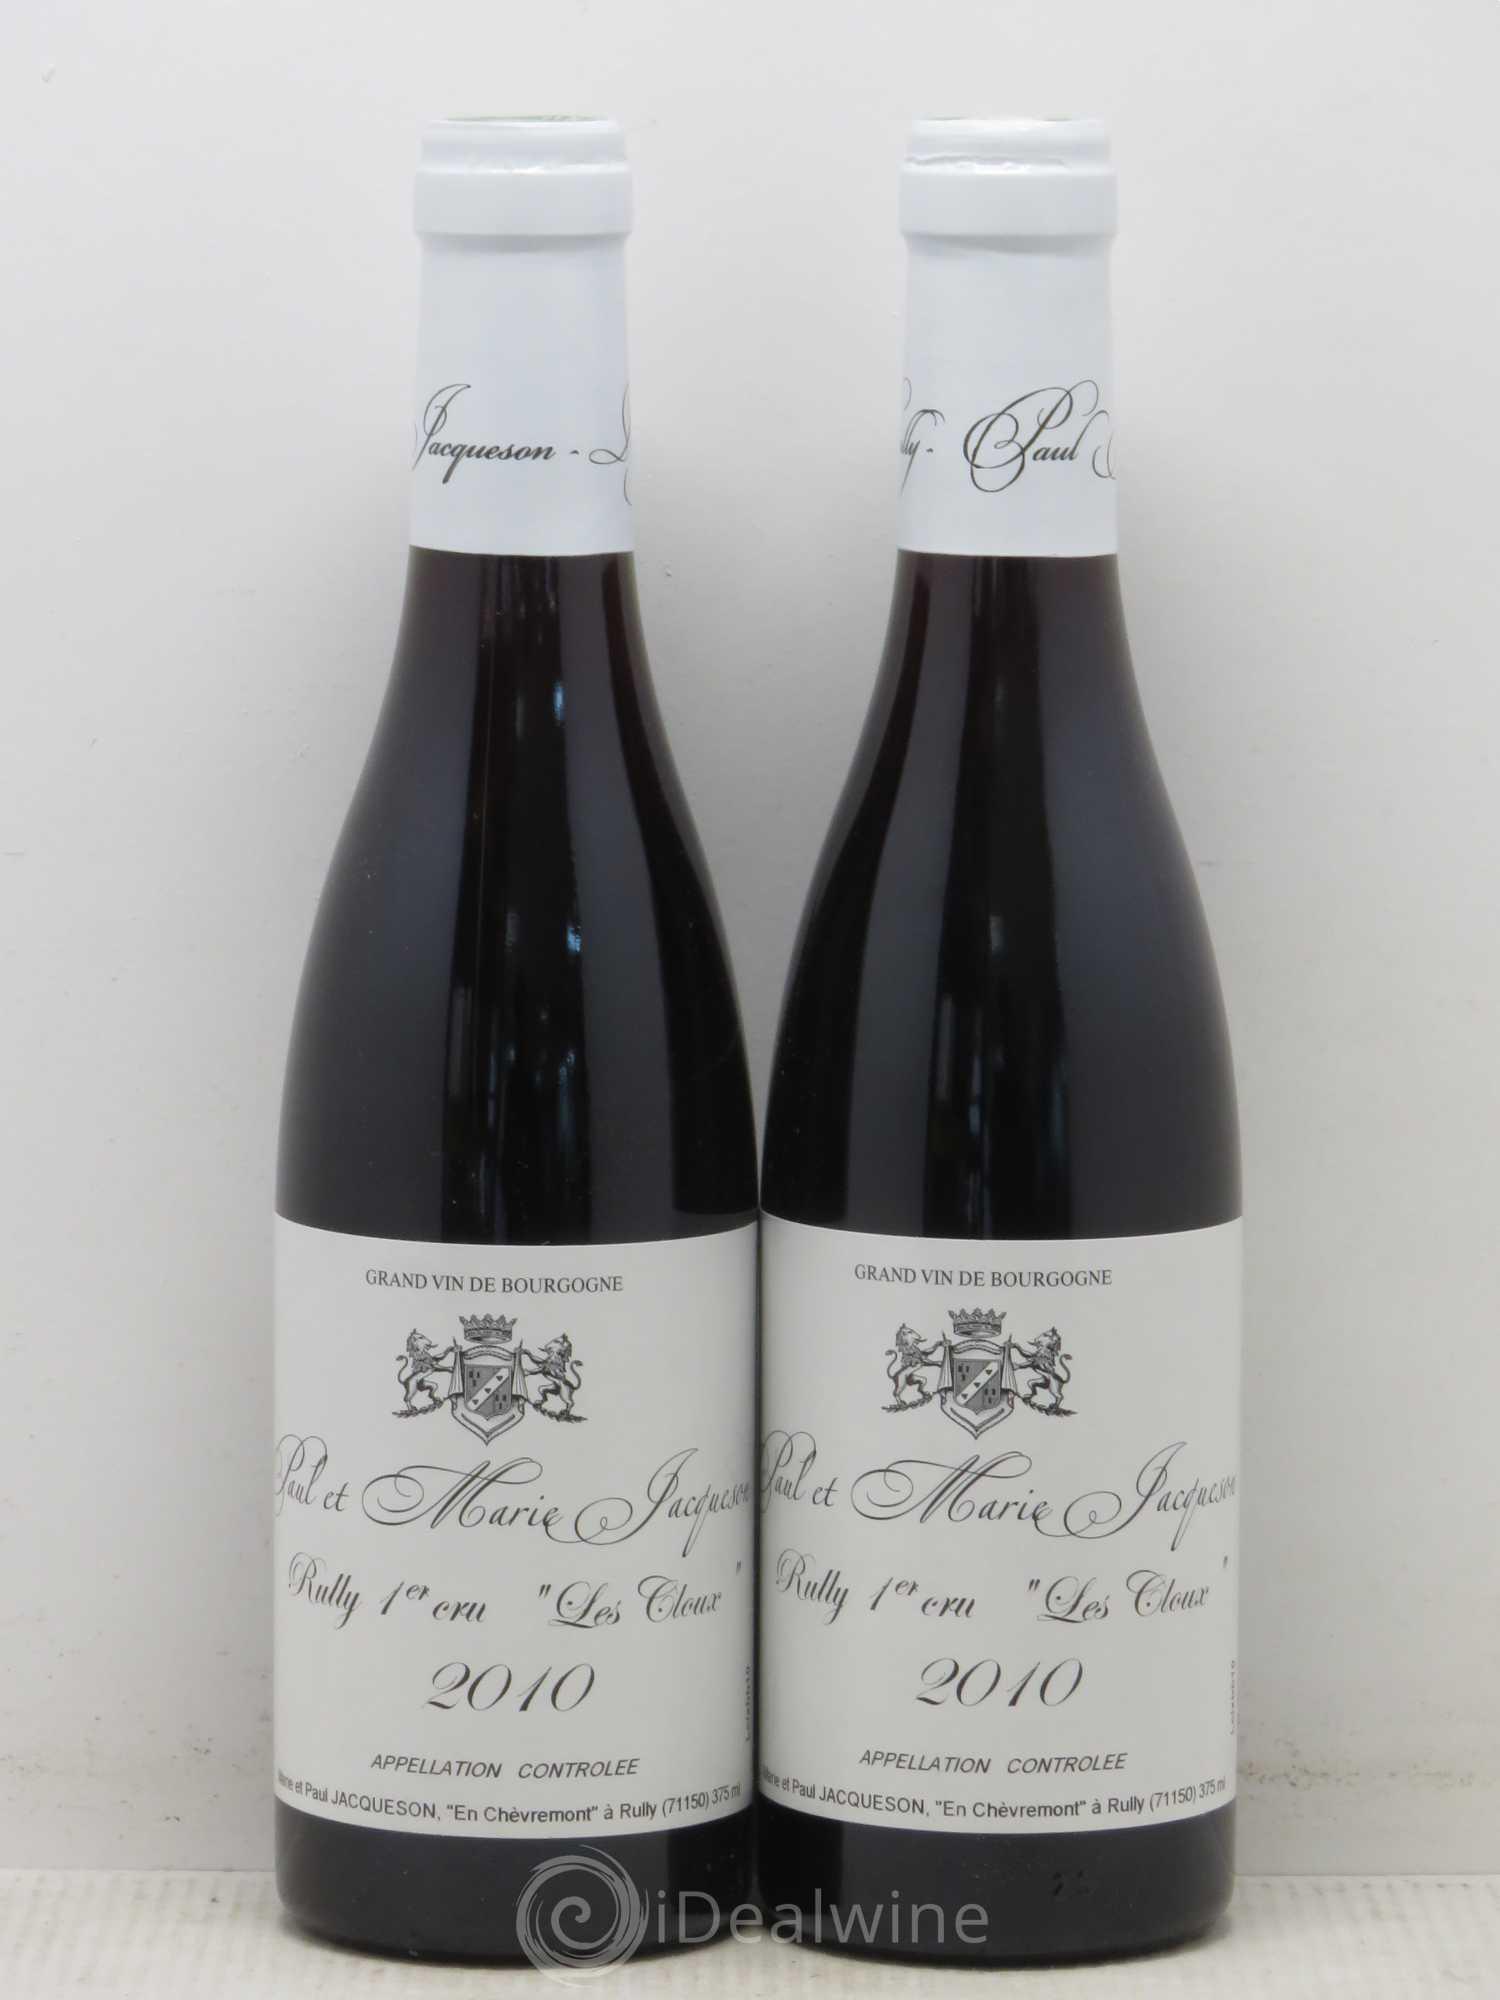 Rully 1er Cru Les Cloux Paul   Marie Jacqueson 2010 - Lot of 2 Half- 343f63a4565a